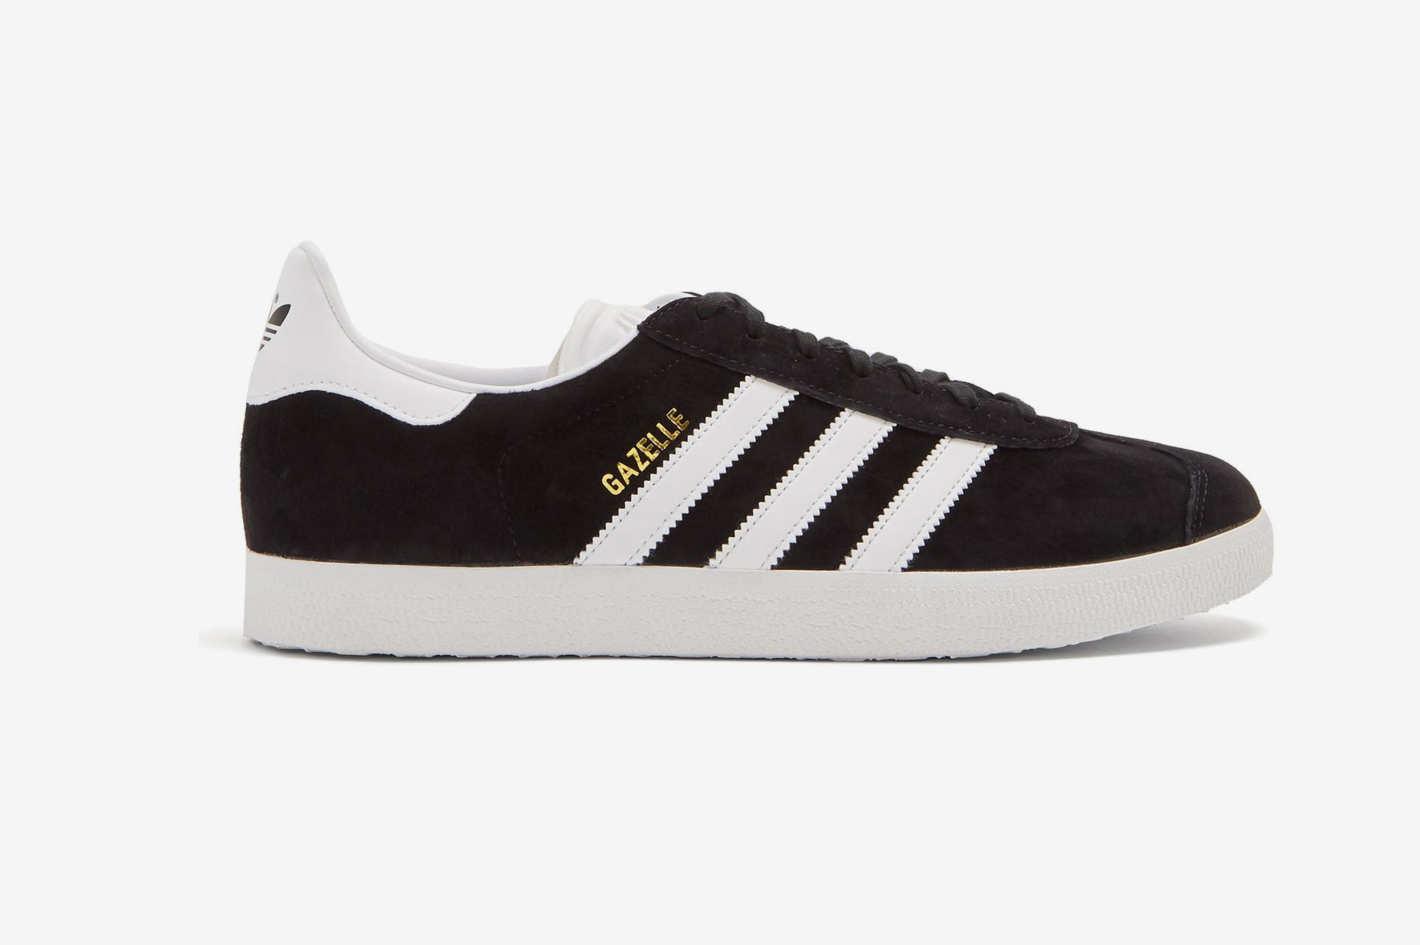 Adidas OriginalsGazelle Suede Low-Top Trainers